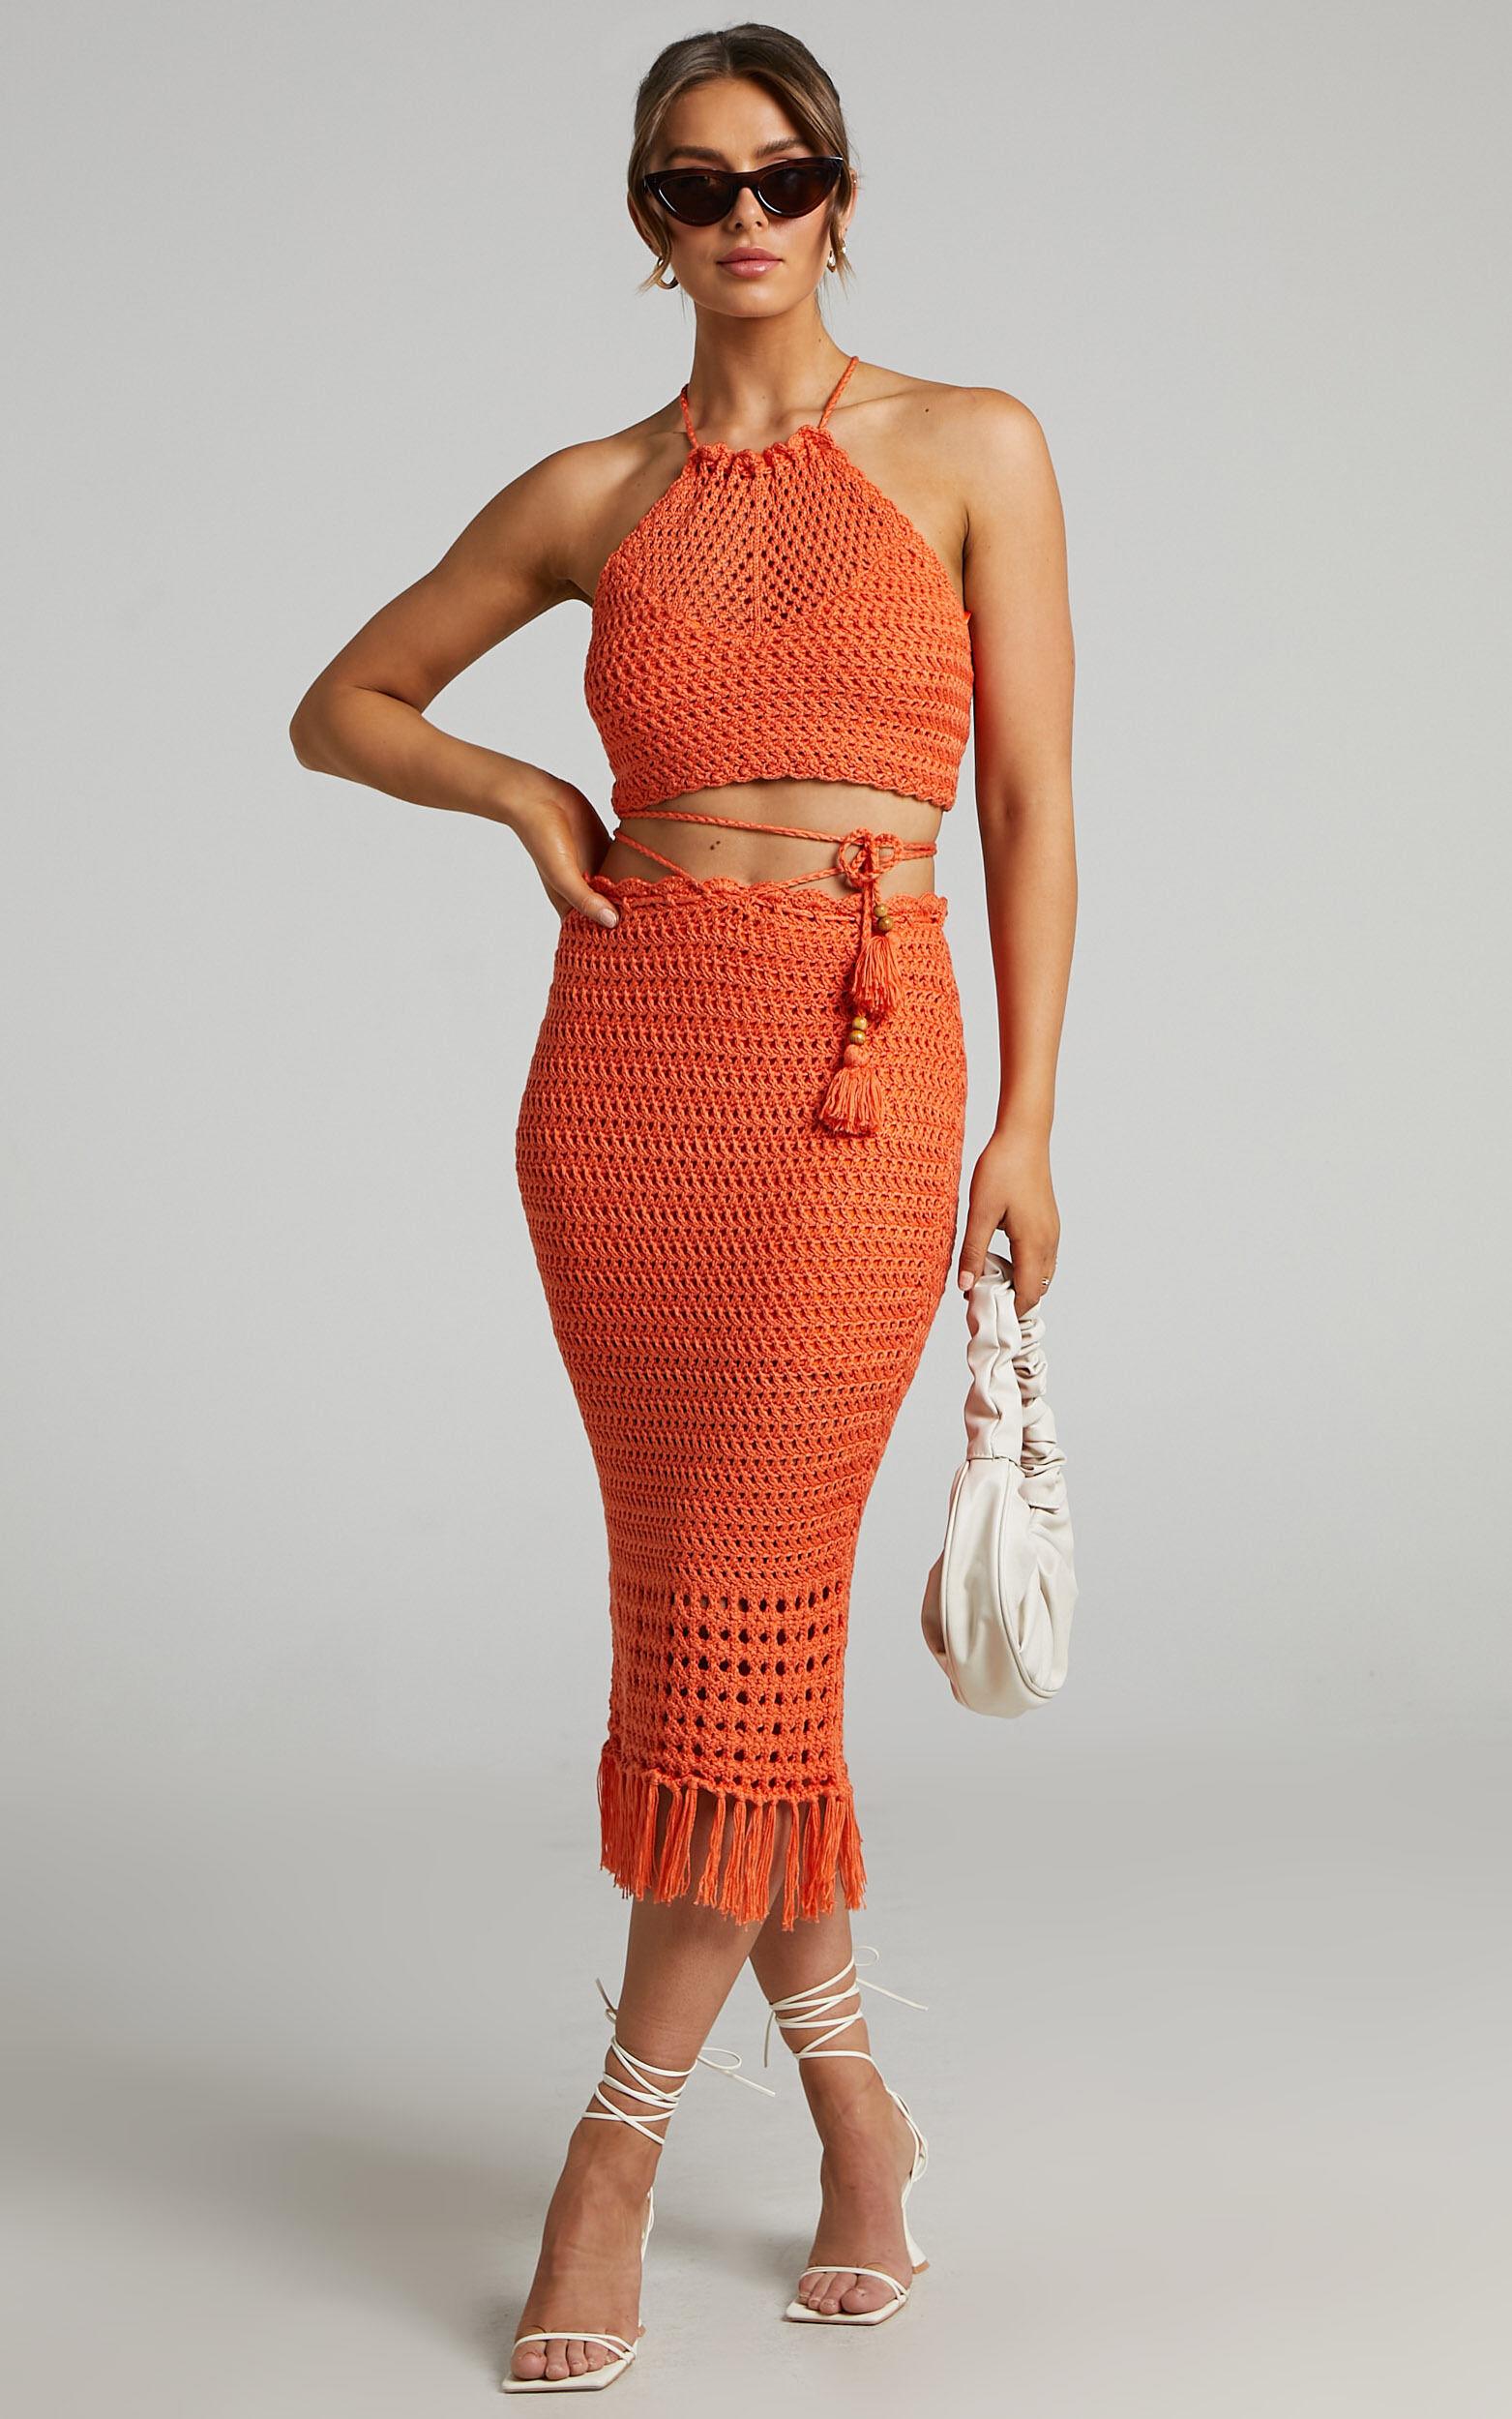 Cappadocia Crochet Midi Skirt in Orange - 06, ORG1, super-hi-res image number null